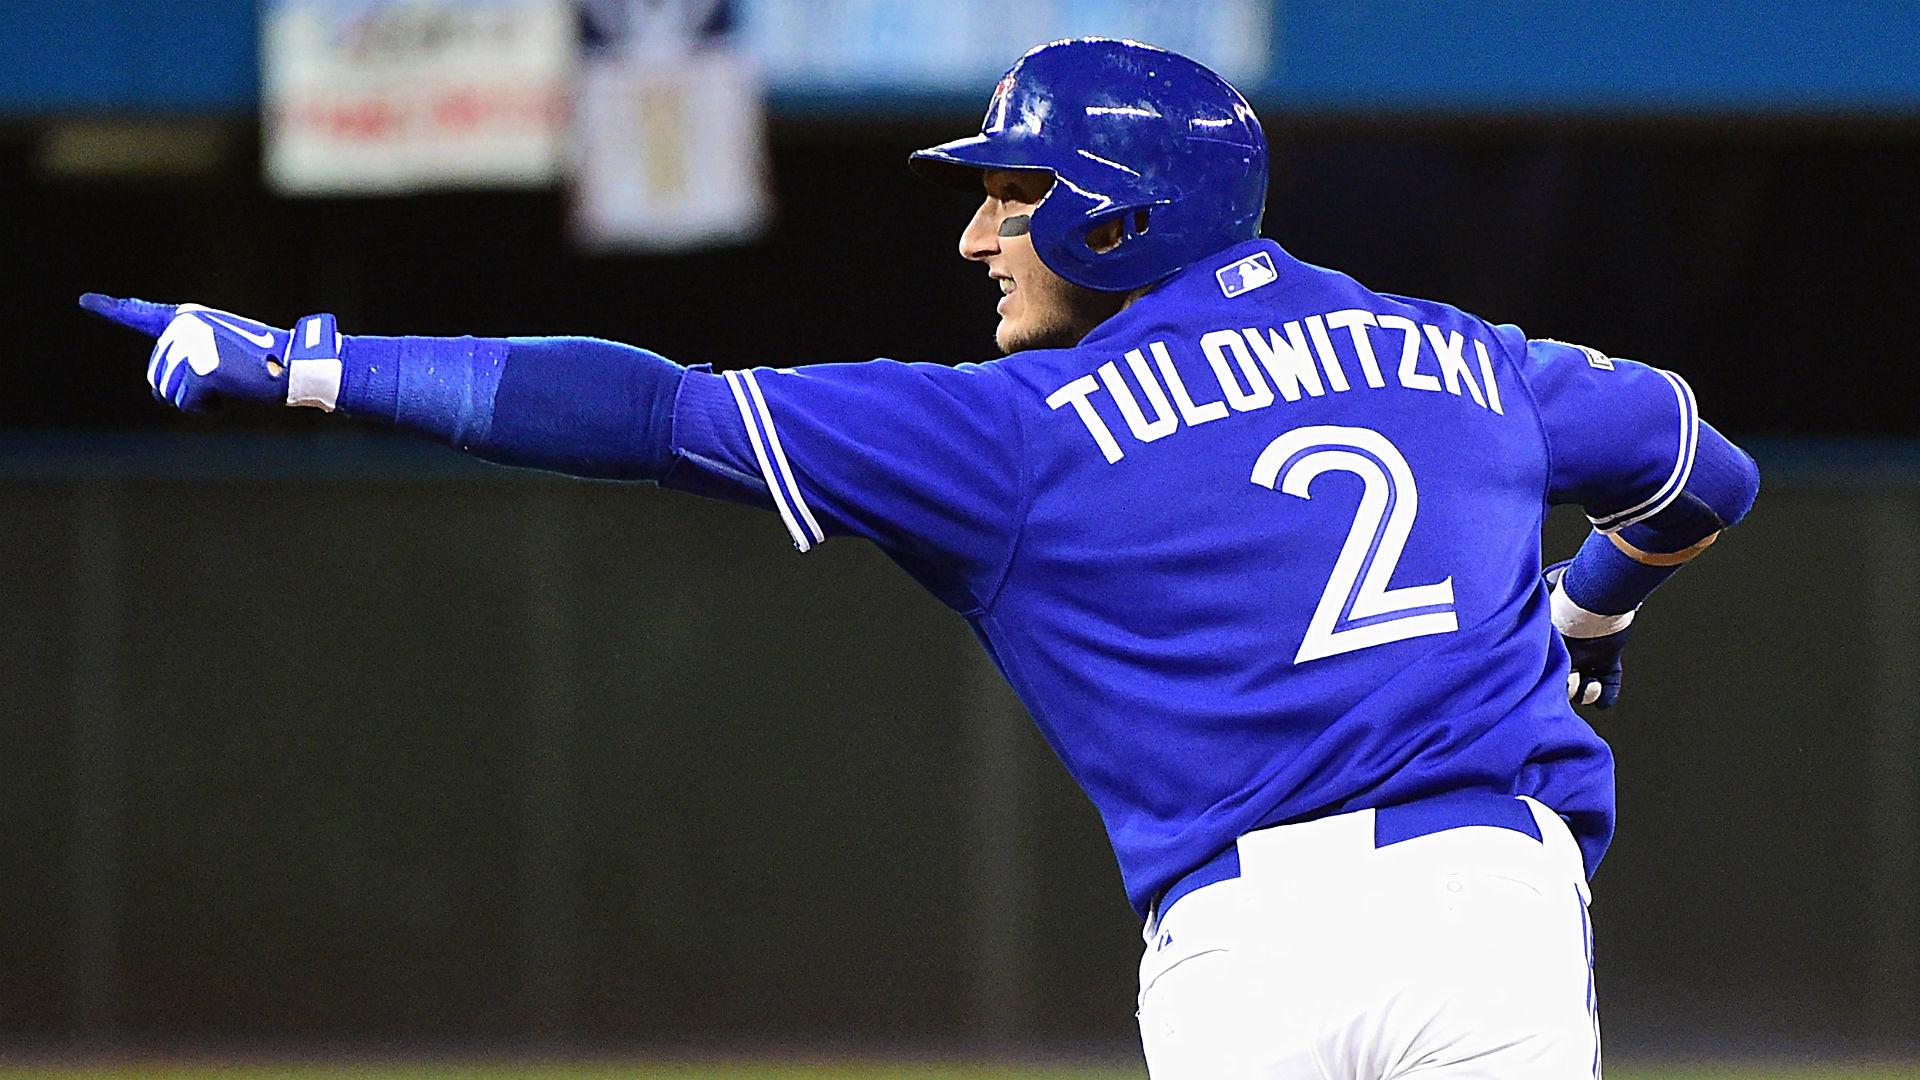 how tall is troy tulowitzki